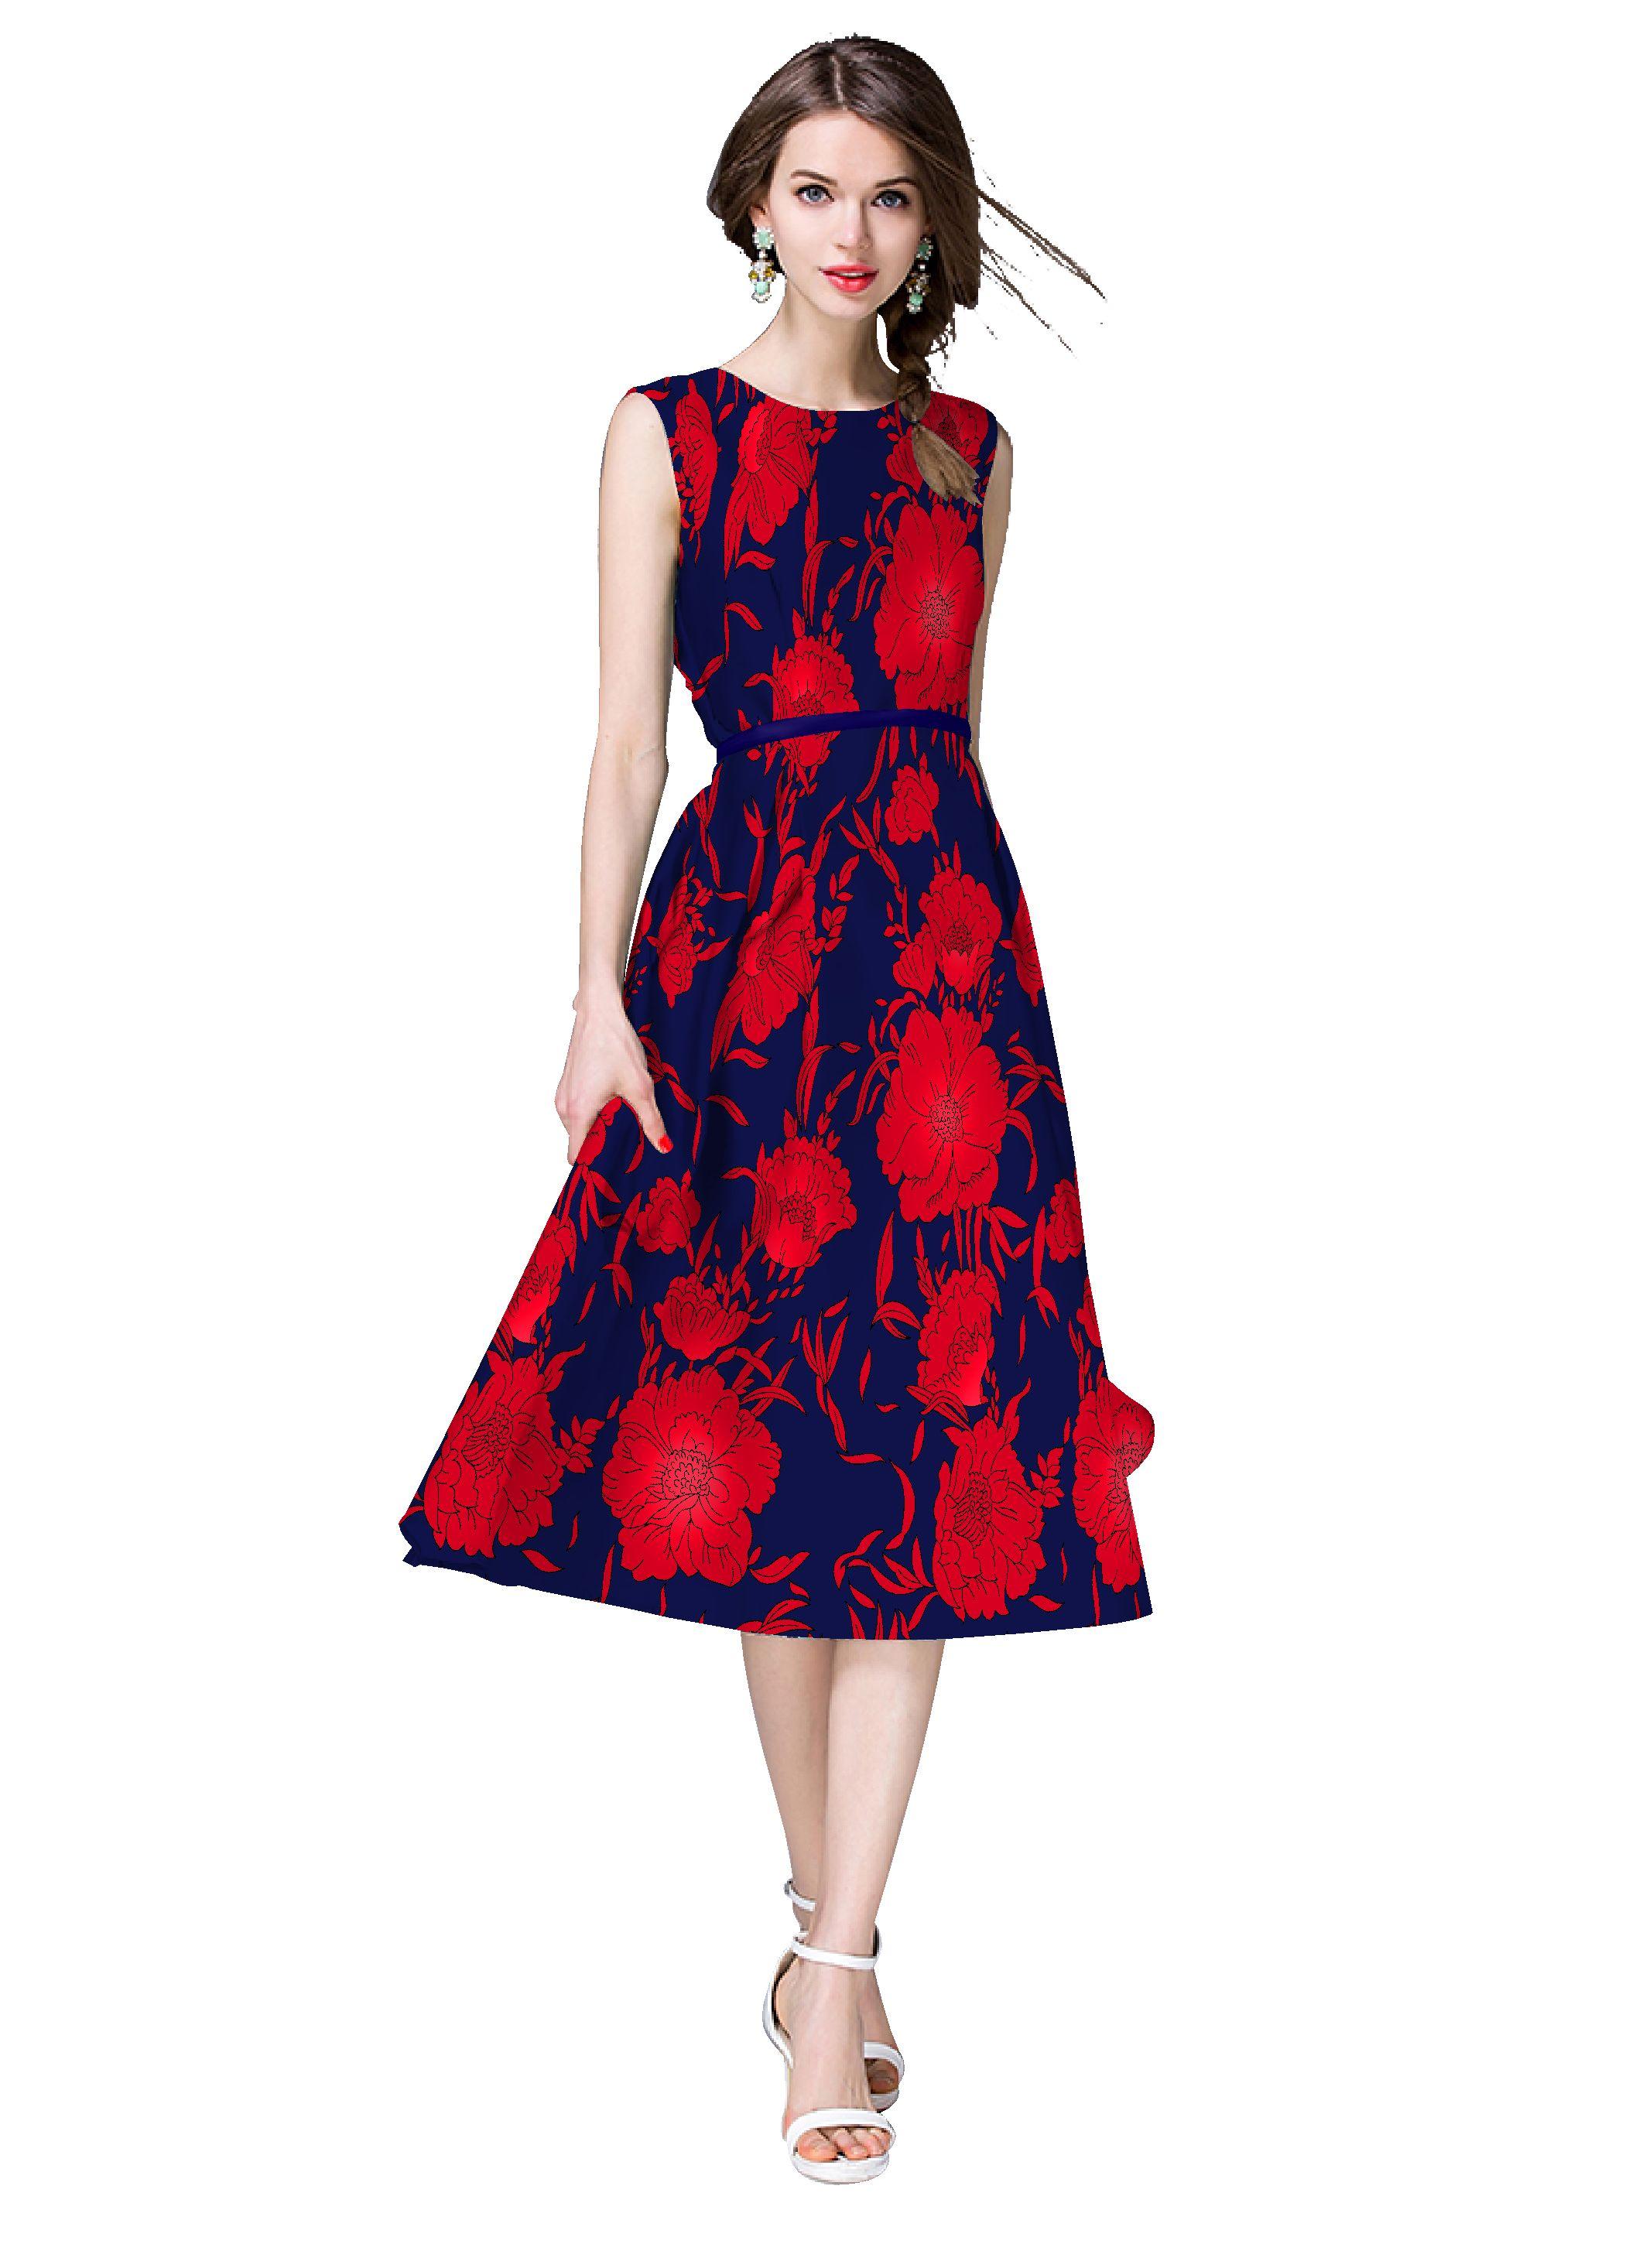 017a6a348c0fe Designer Party Wear One Piece Dresses